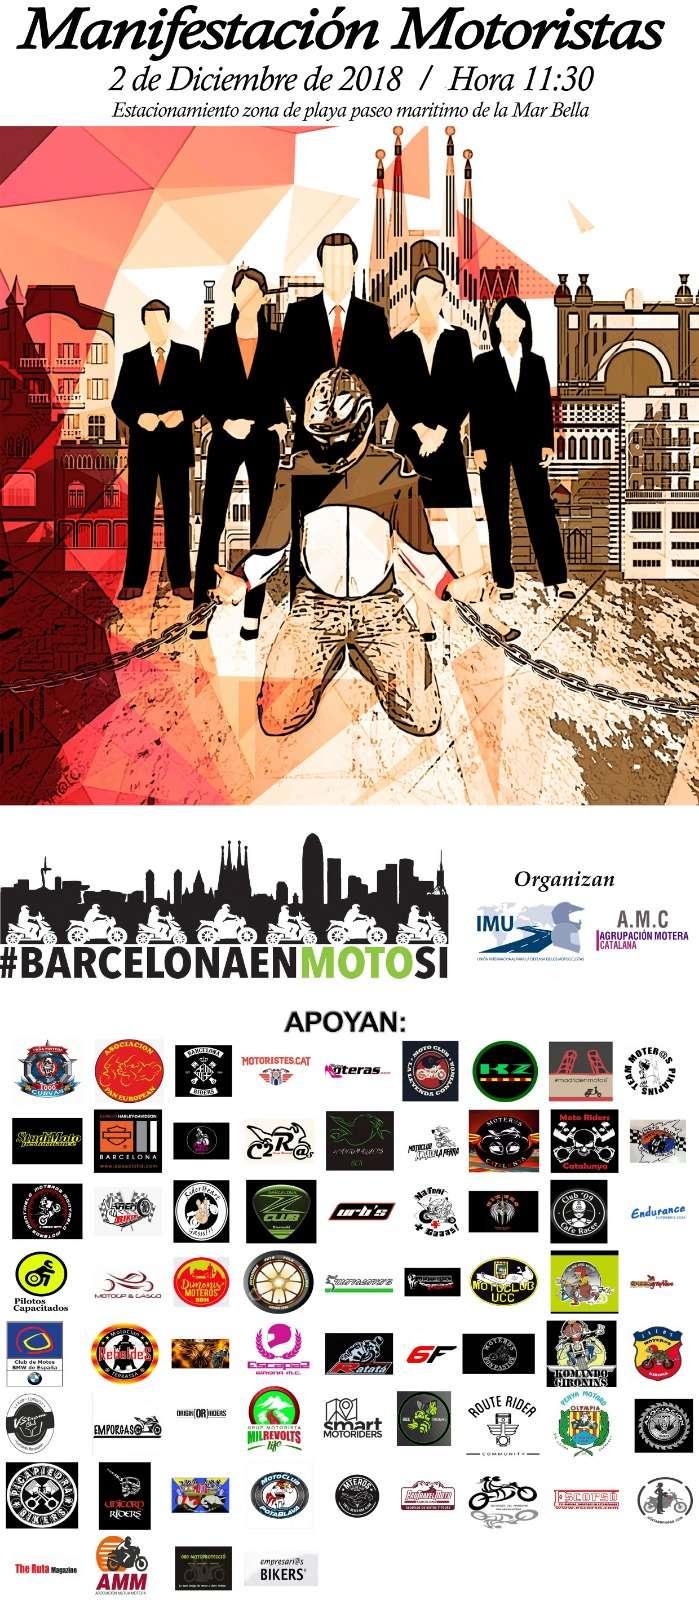 MANIFESTACIÓN MOTORISTAS (CAT): Barcelona 2 de Diciembre de 2018 11:30 Ba7f6010